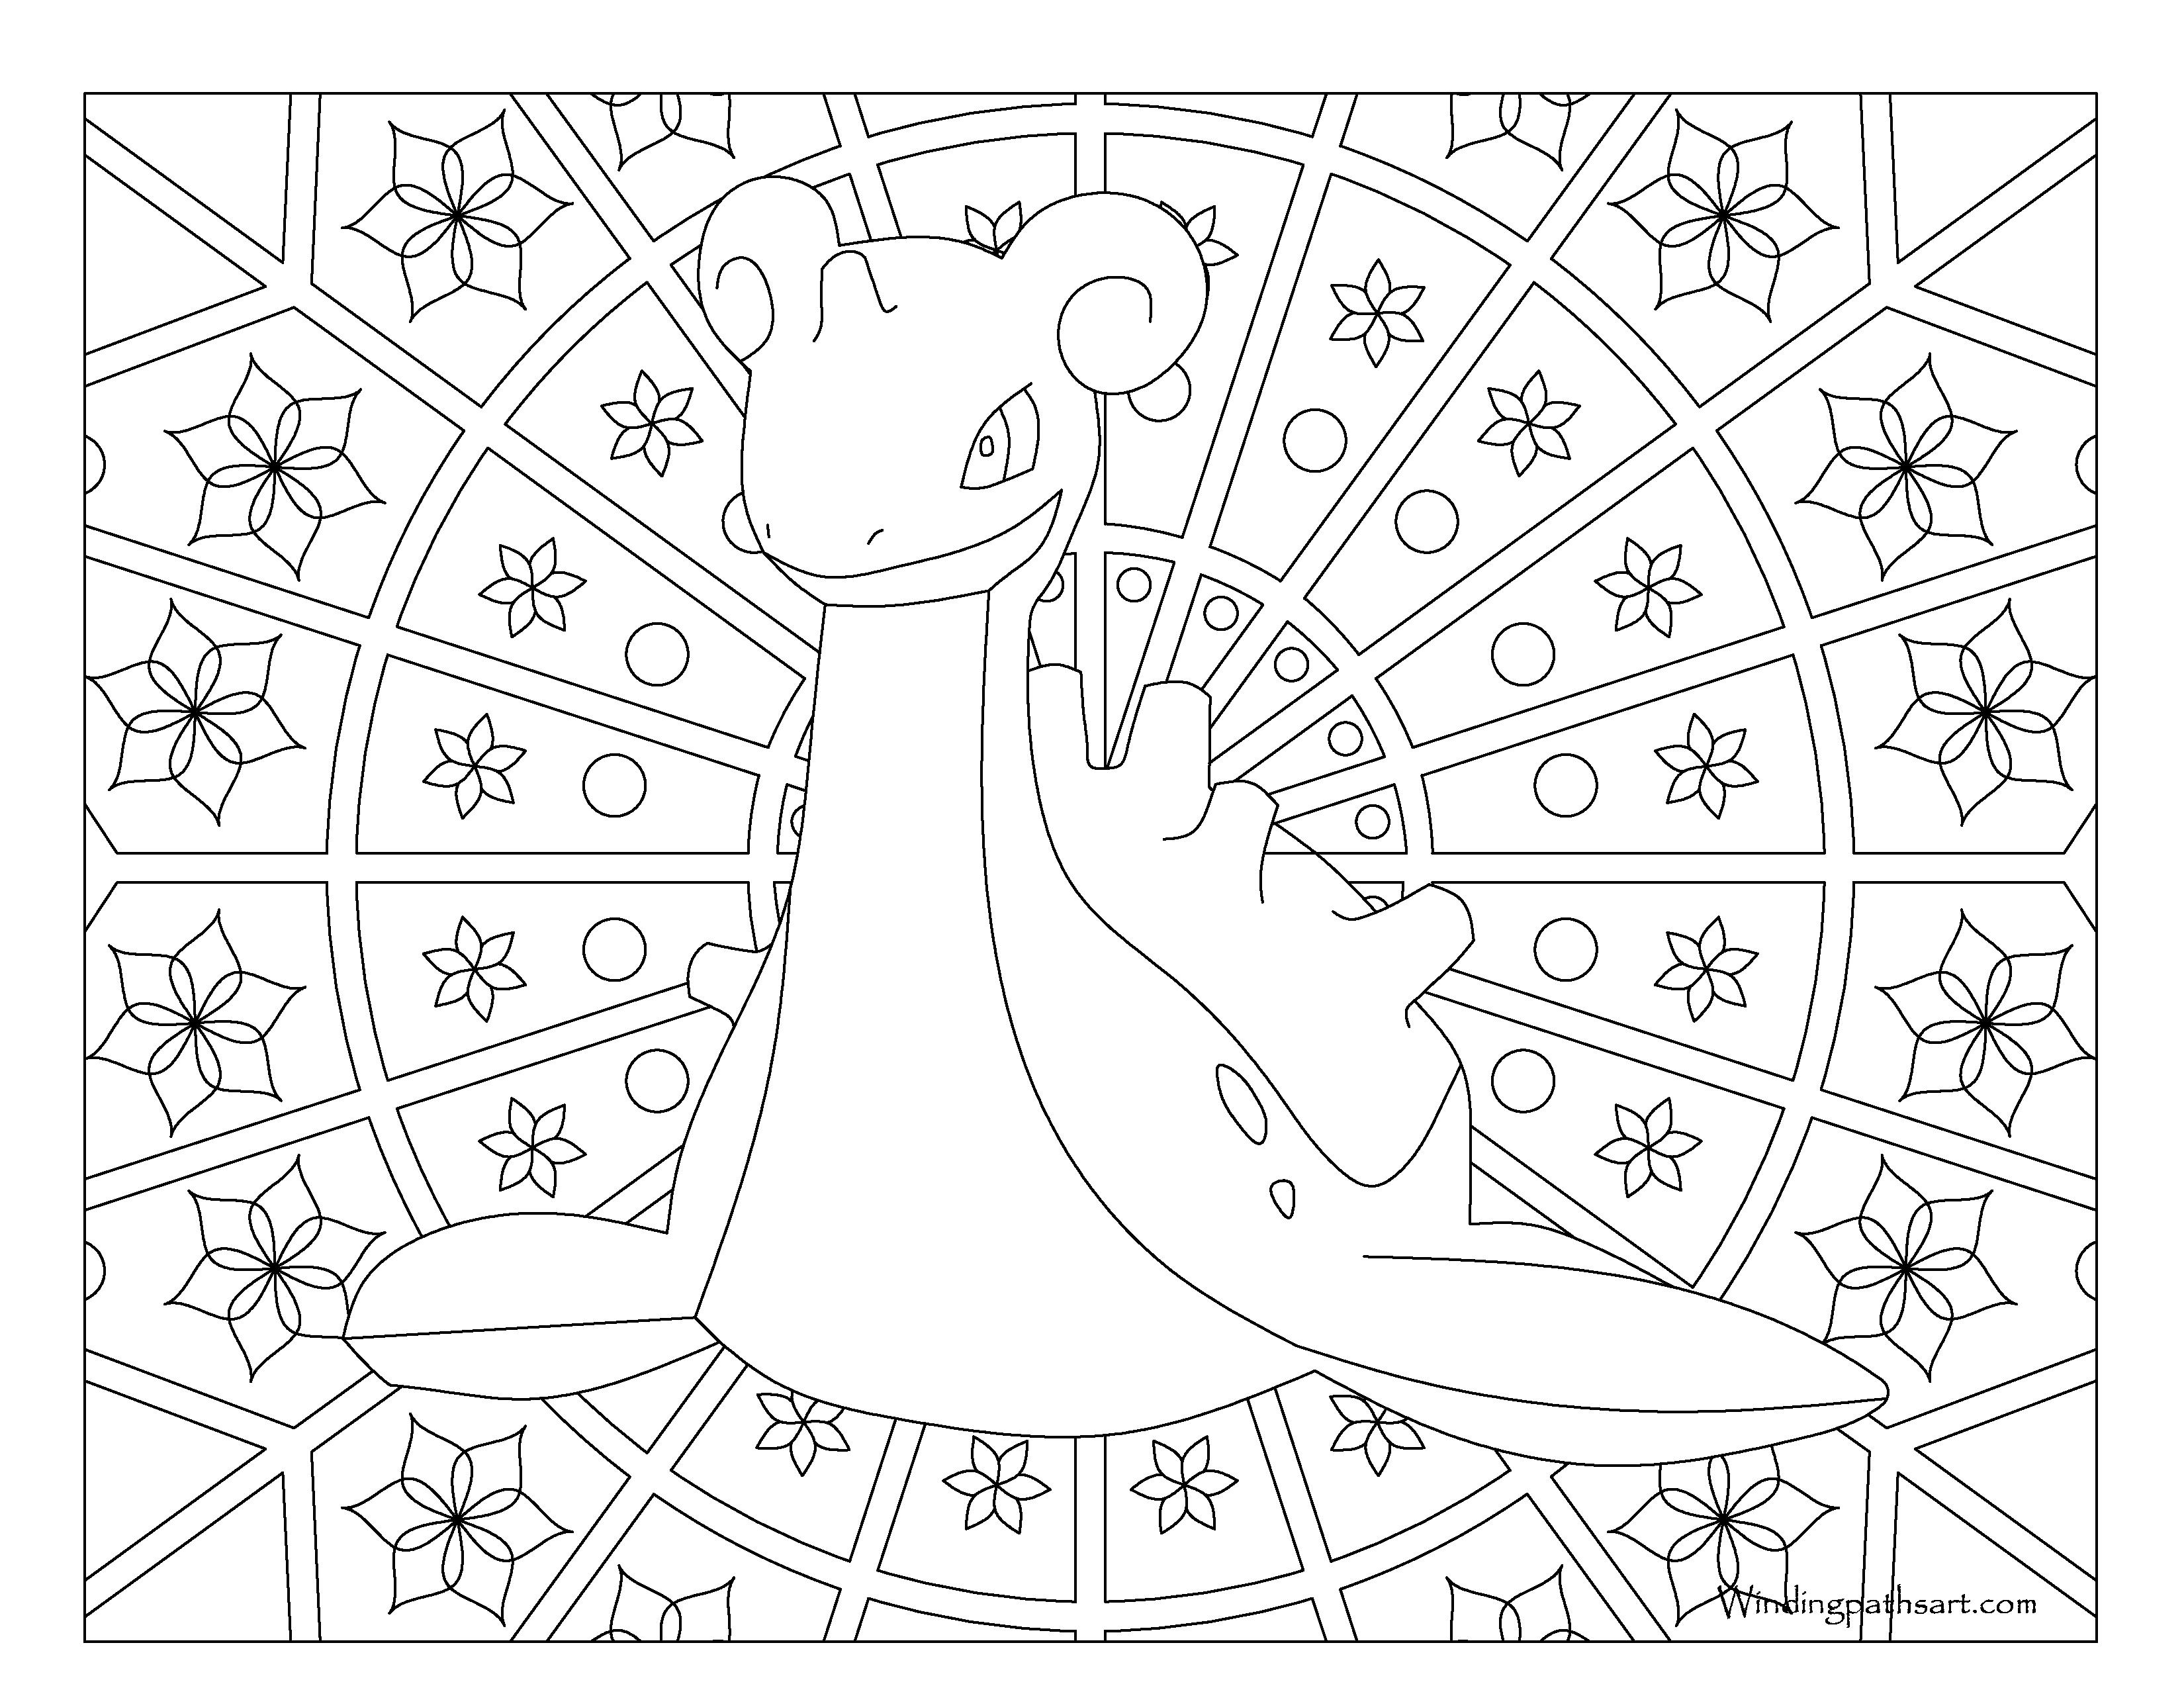 Lapras Coloring Page